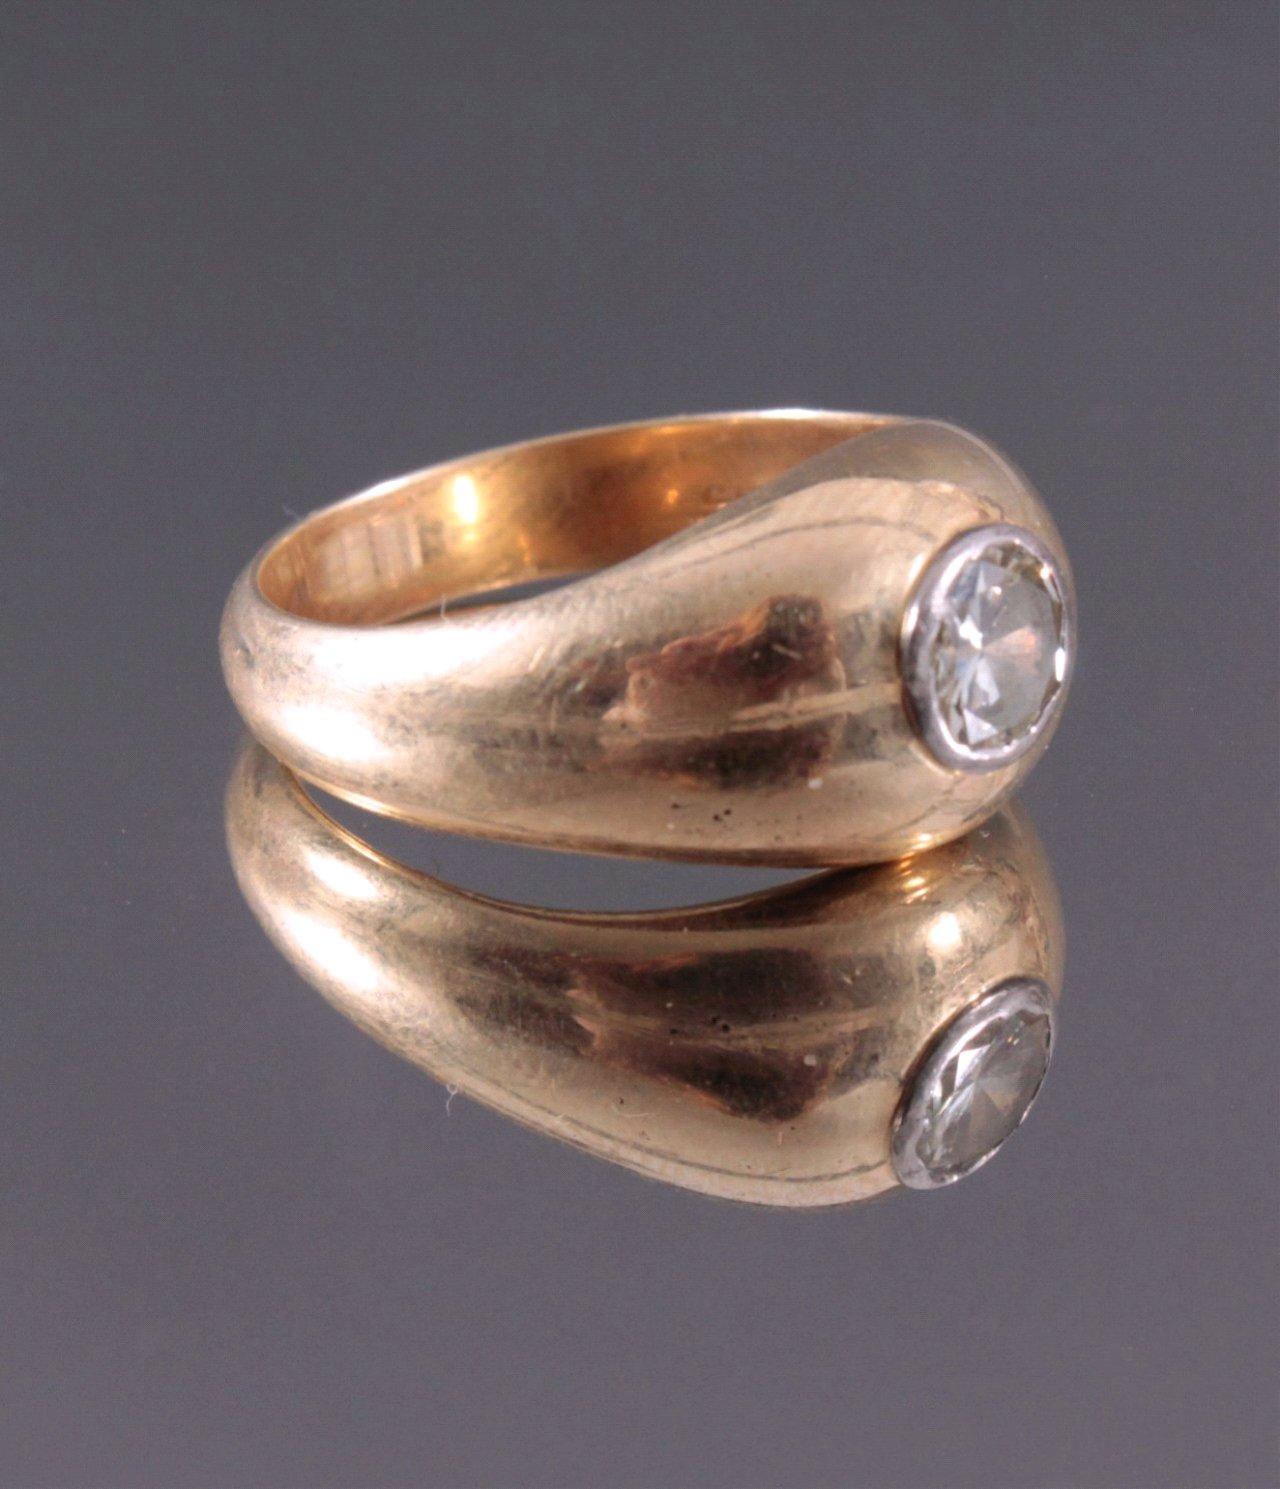 Herrenring mit großem Diamant, 585/000 Gelbgold-1